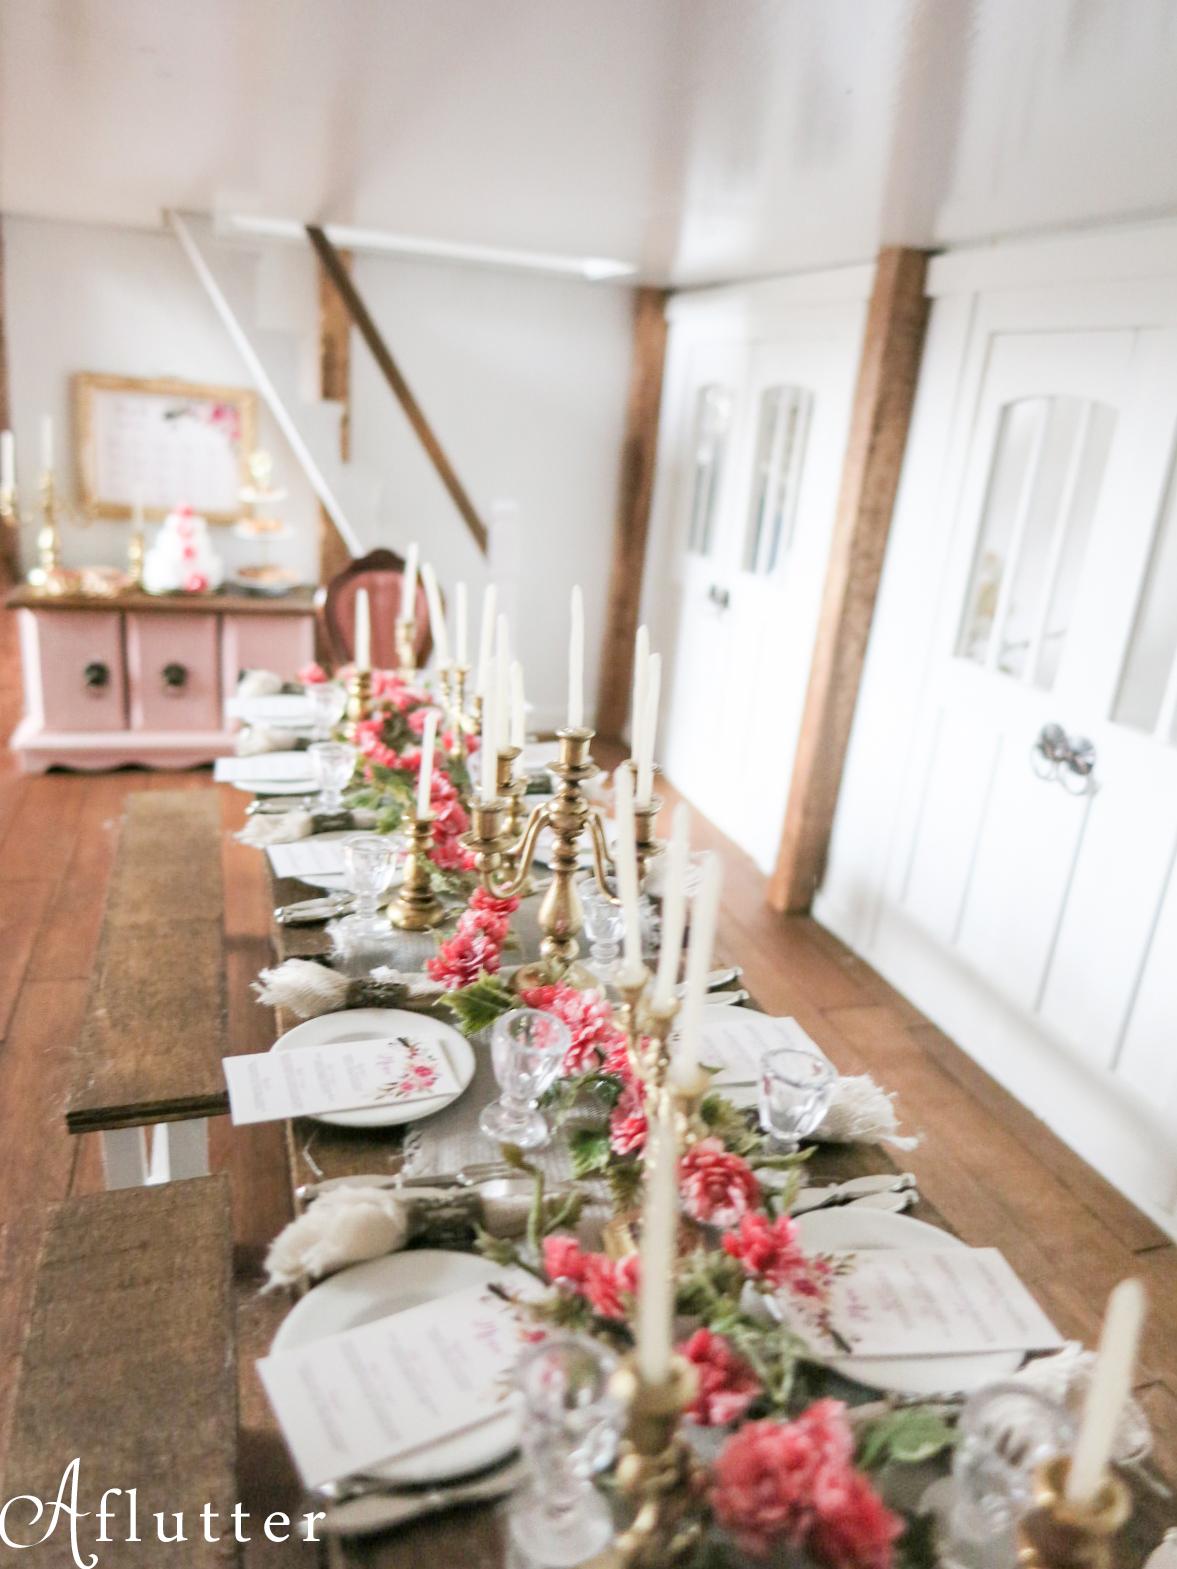 Brenul-Barn-Mini-Wedding-16-of-16.jpg